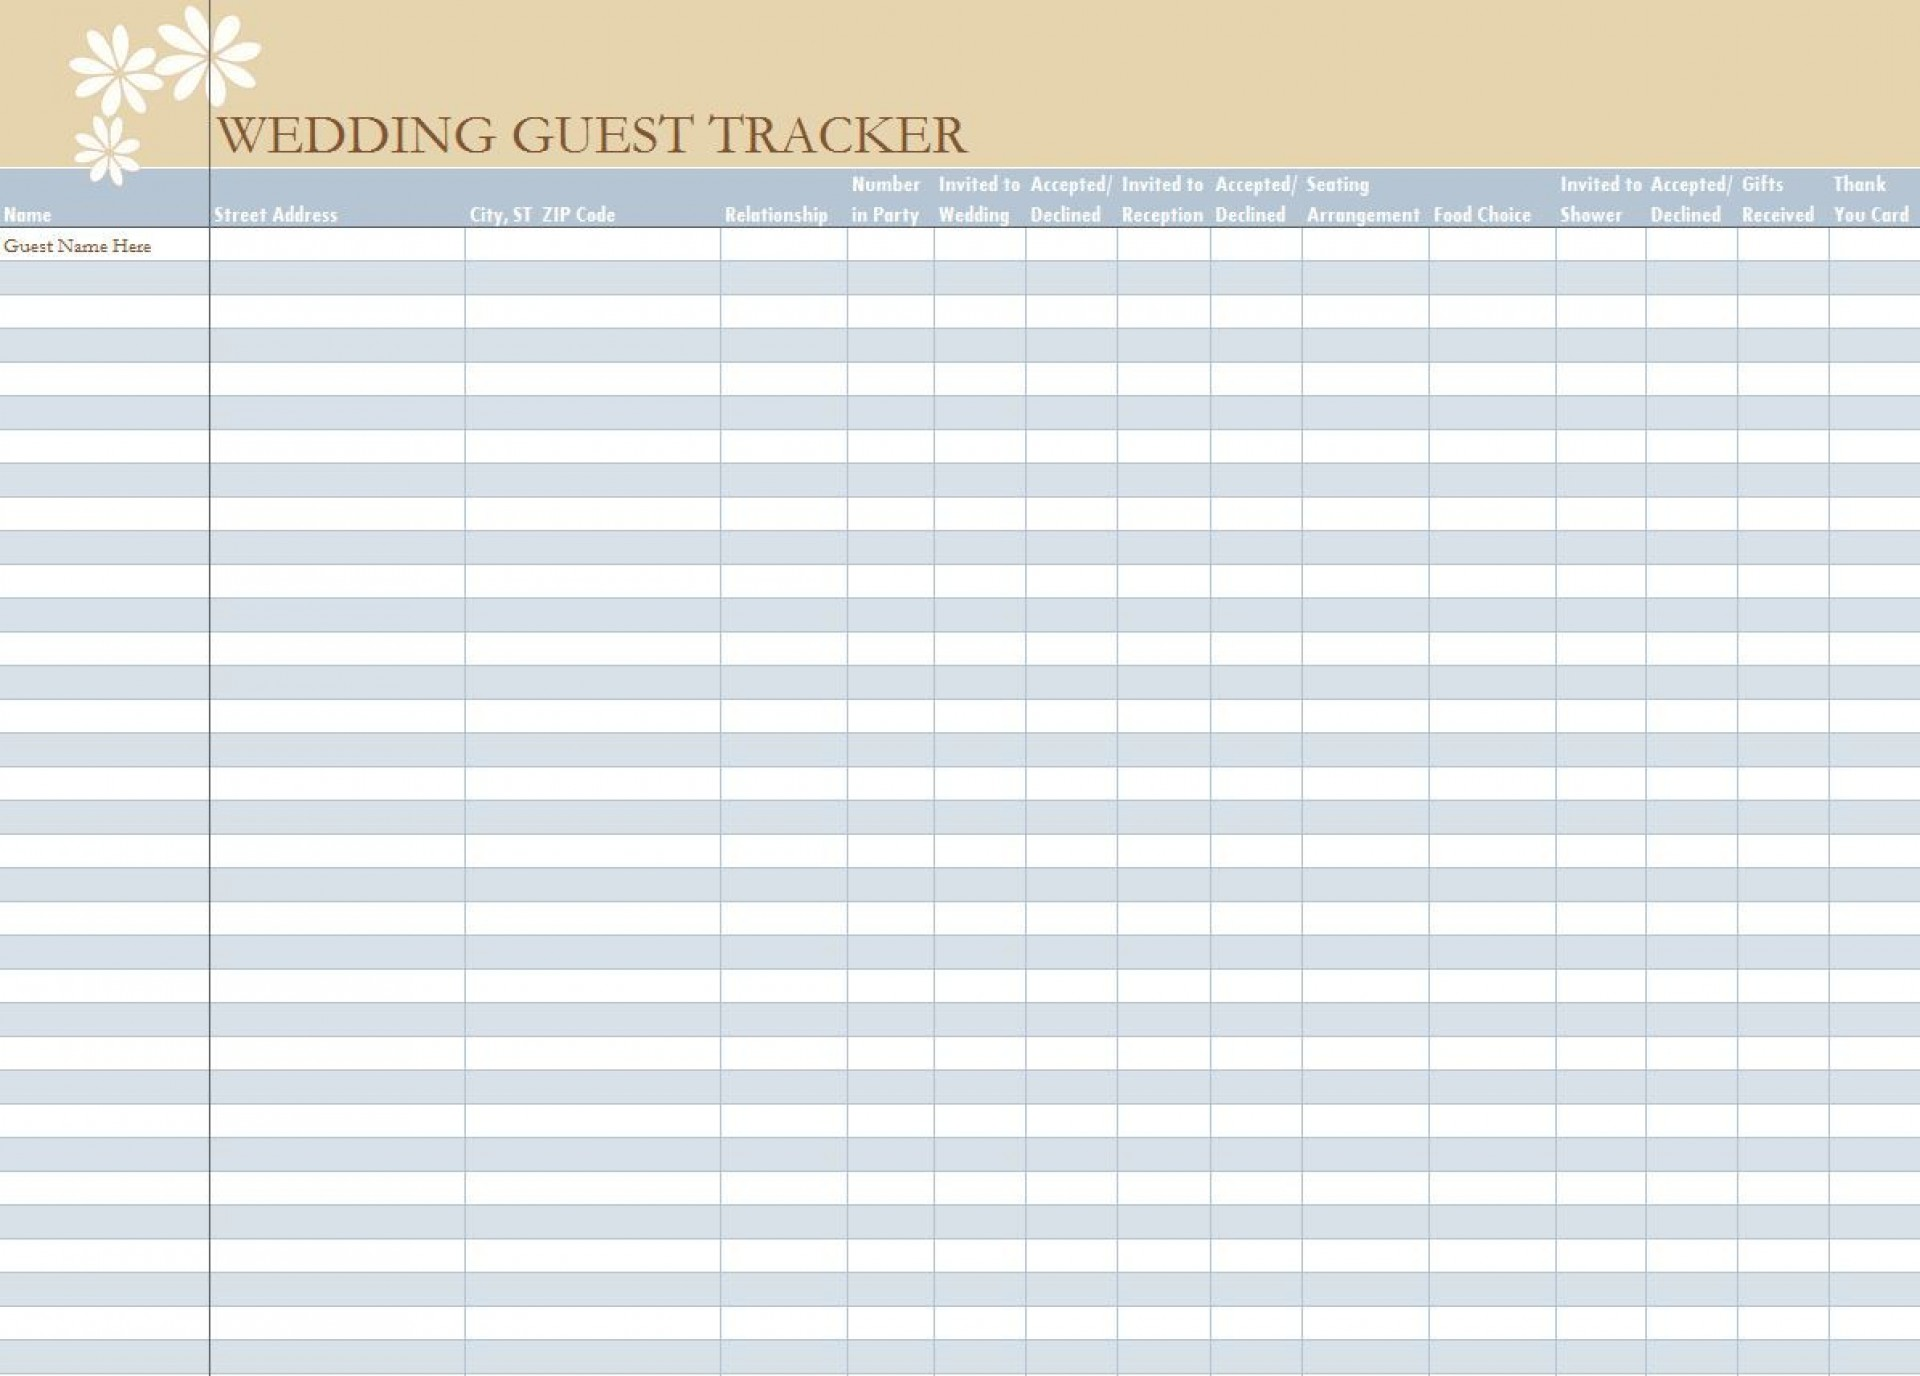 006 Unbelievable Wedding Guest List Excel Spreadsheet Template Picture 1920